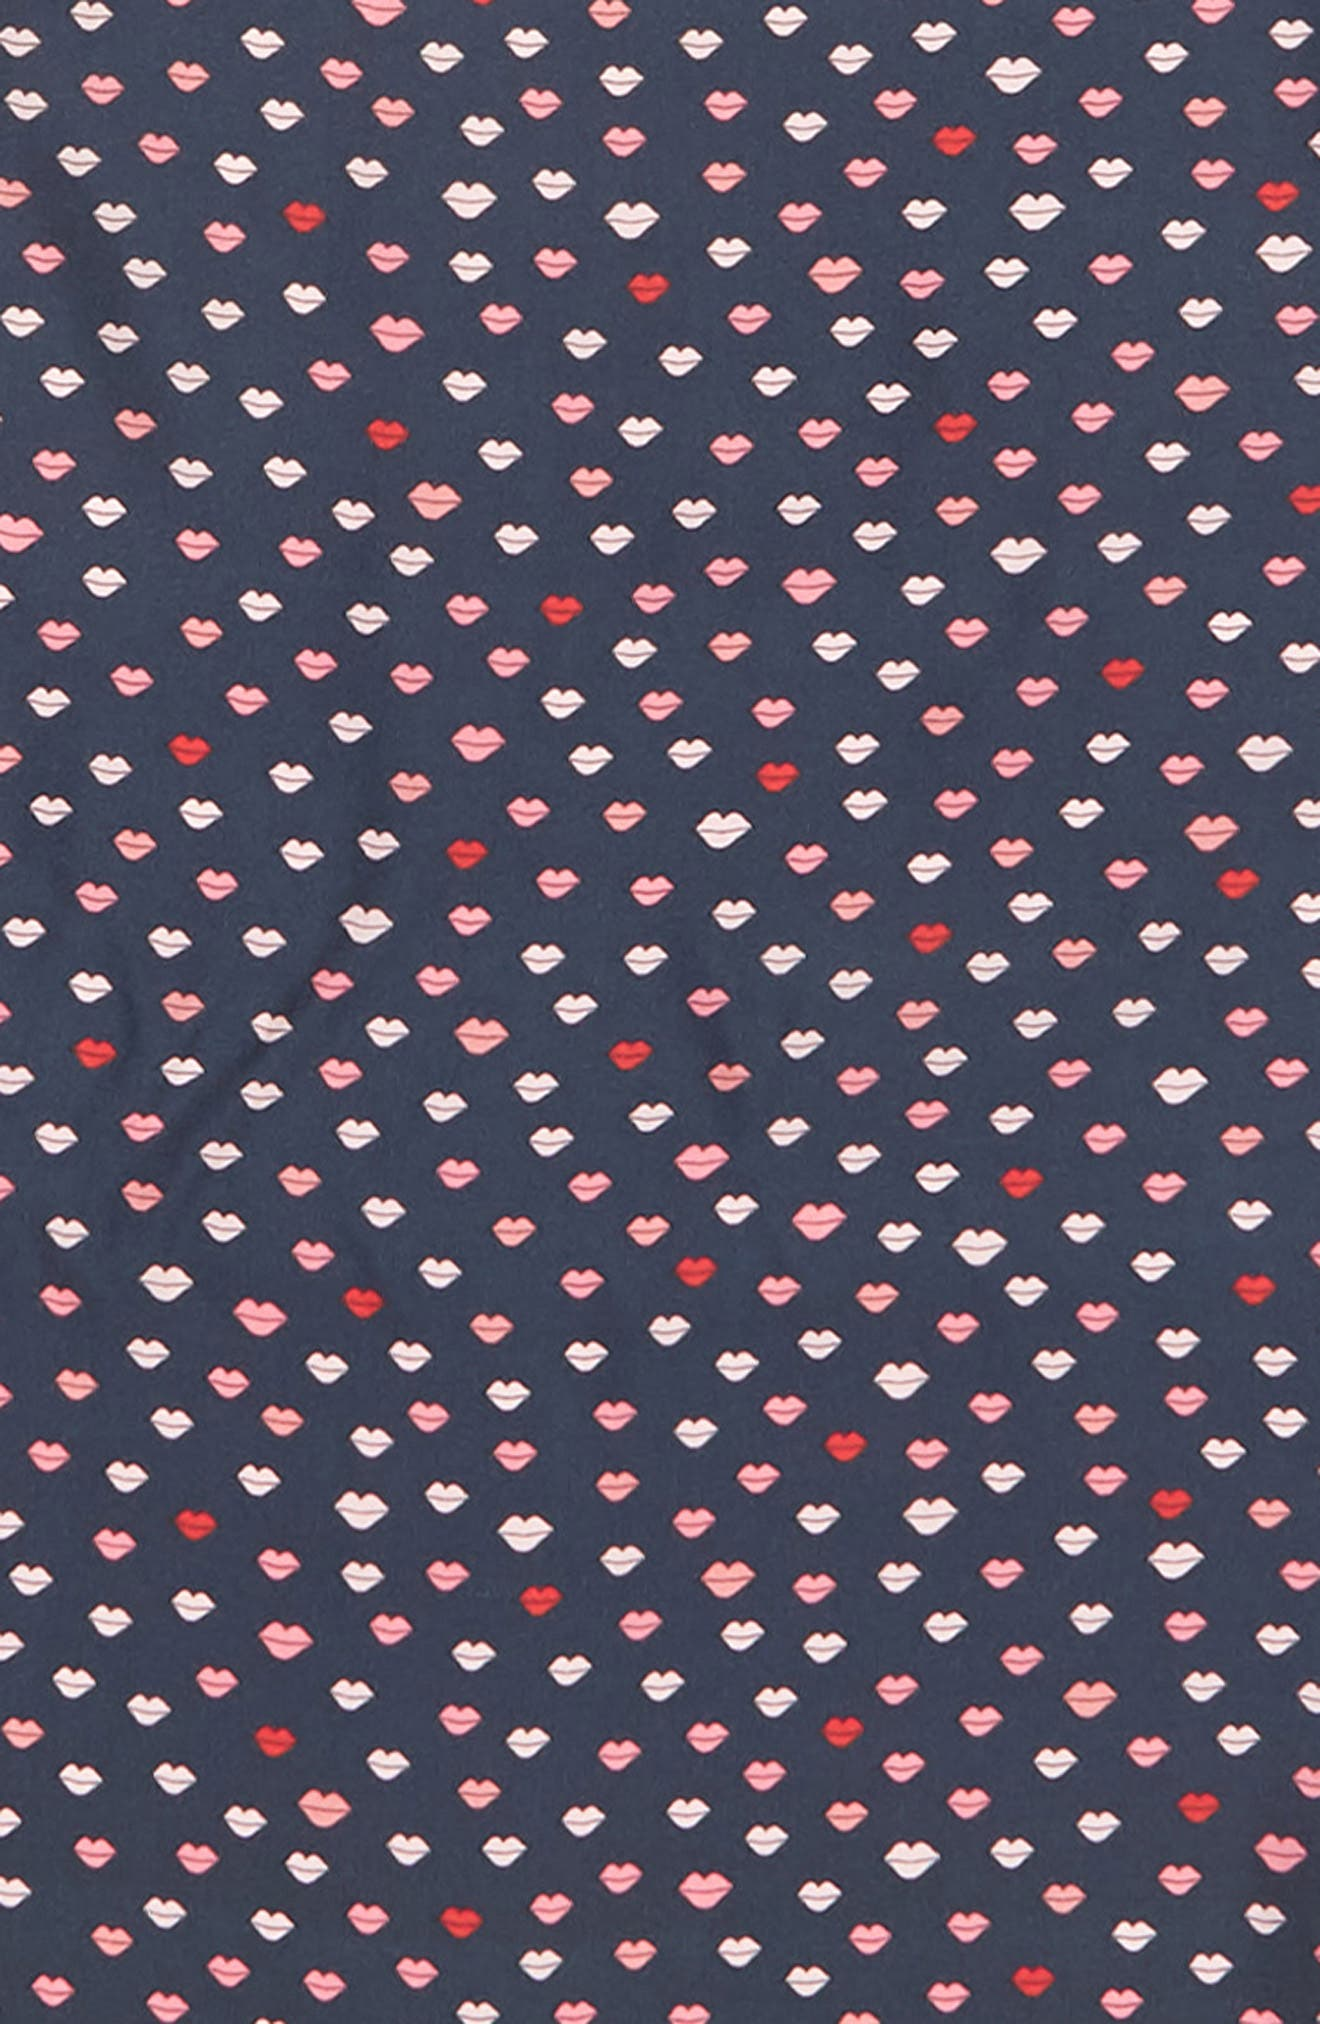 KATE SPADE NEW YORK,                             lips diamond silk scarf,                             Alternate thumbnail 4, color,                             PARISIAN NAVY